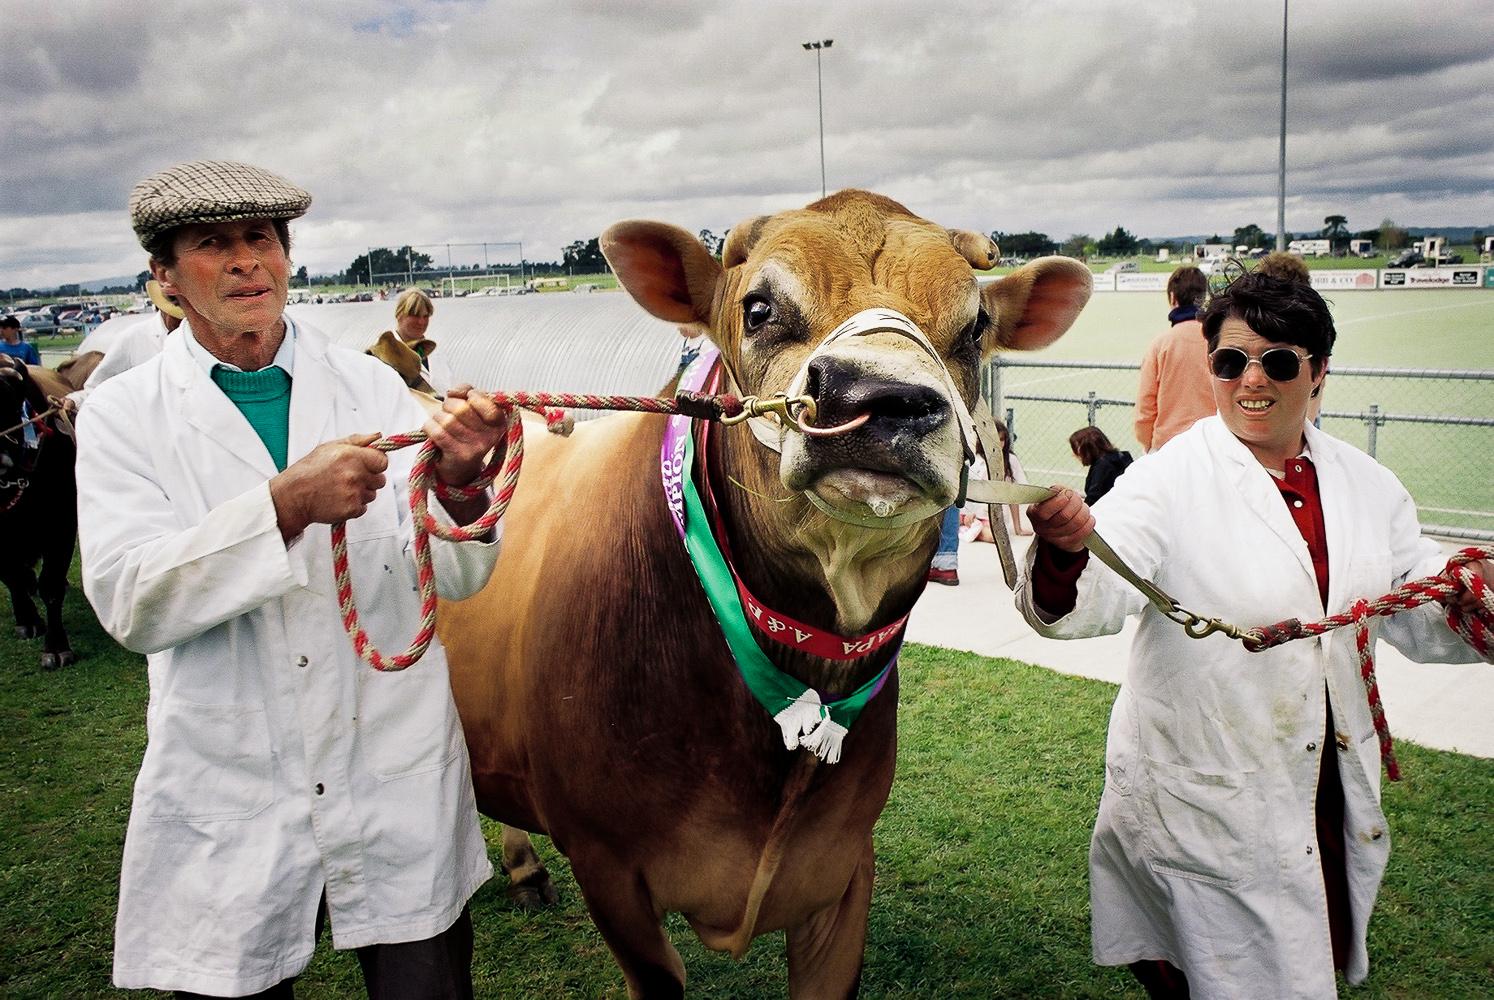 AP-Show-Cow-Wellington-photographer-Paul-Fisher.jpg